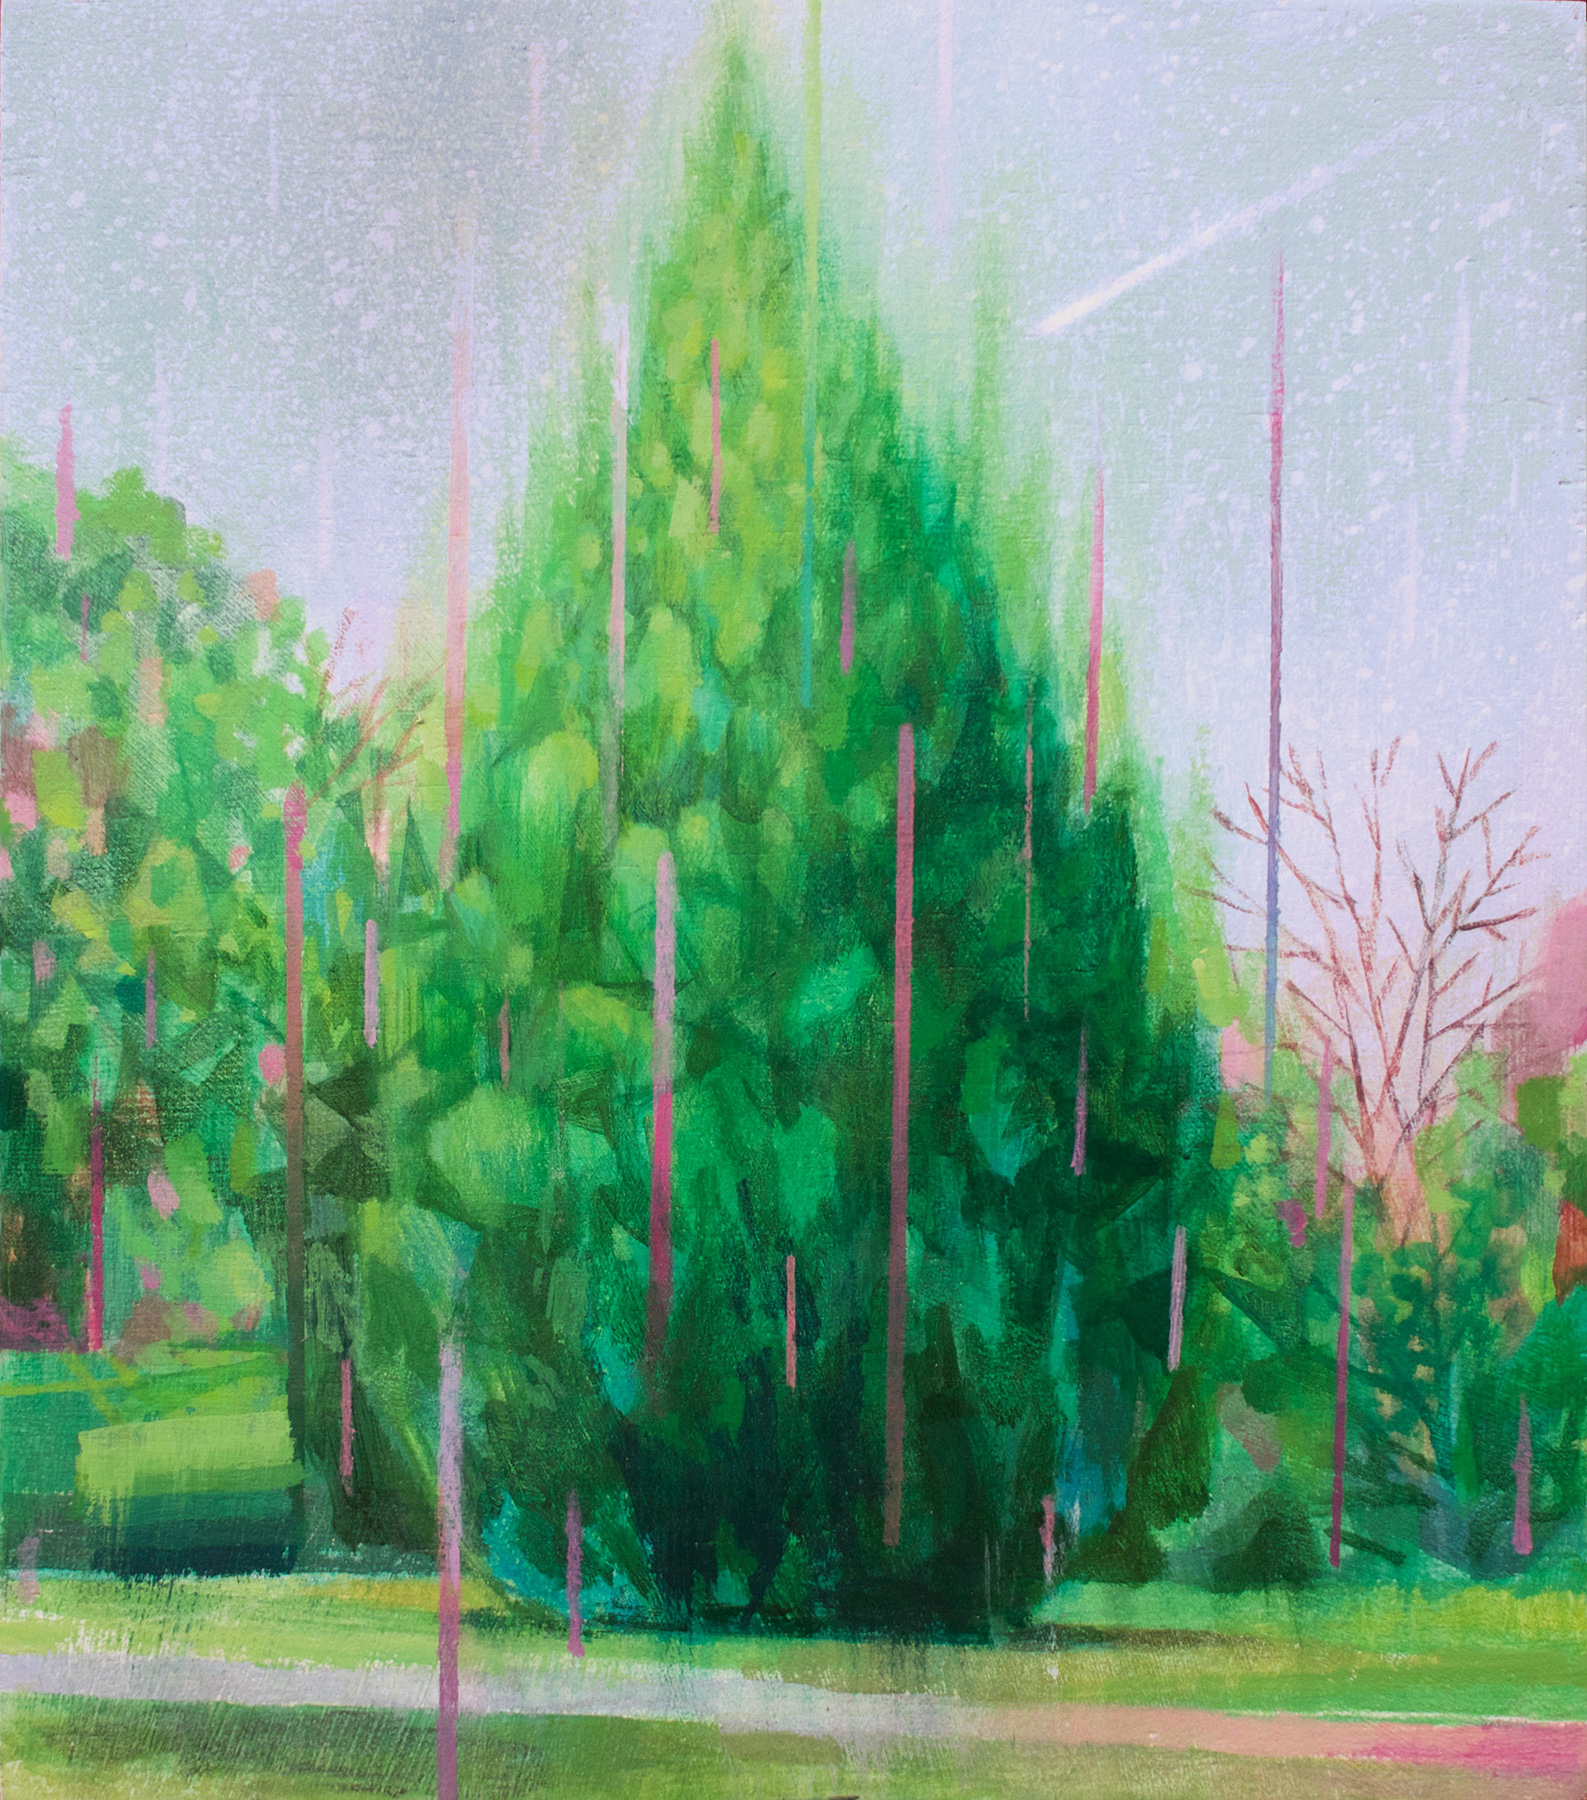 Eli McMullen Big Bush acrylic on panel 8 in. x 9 in. $600 2017.jpg